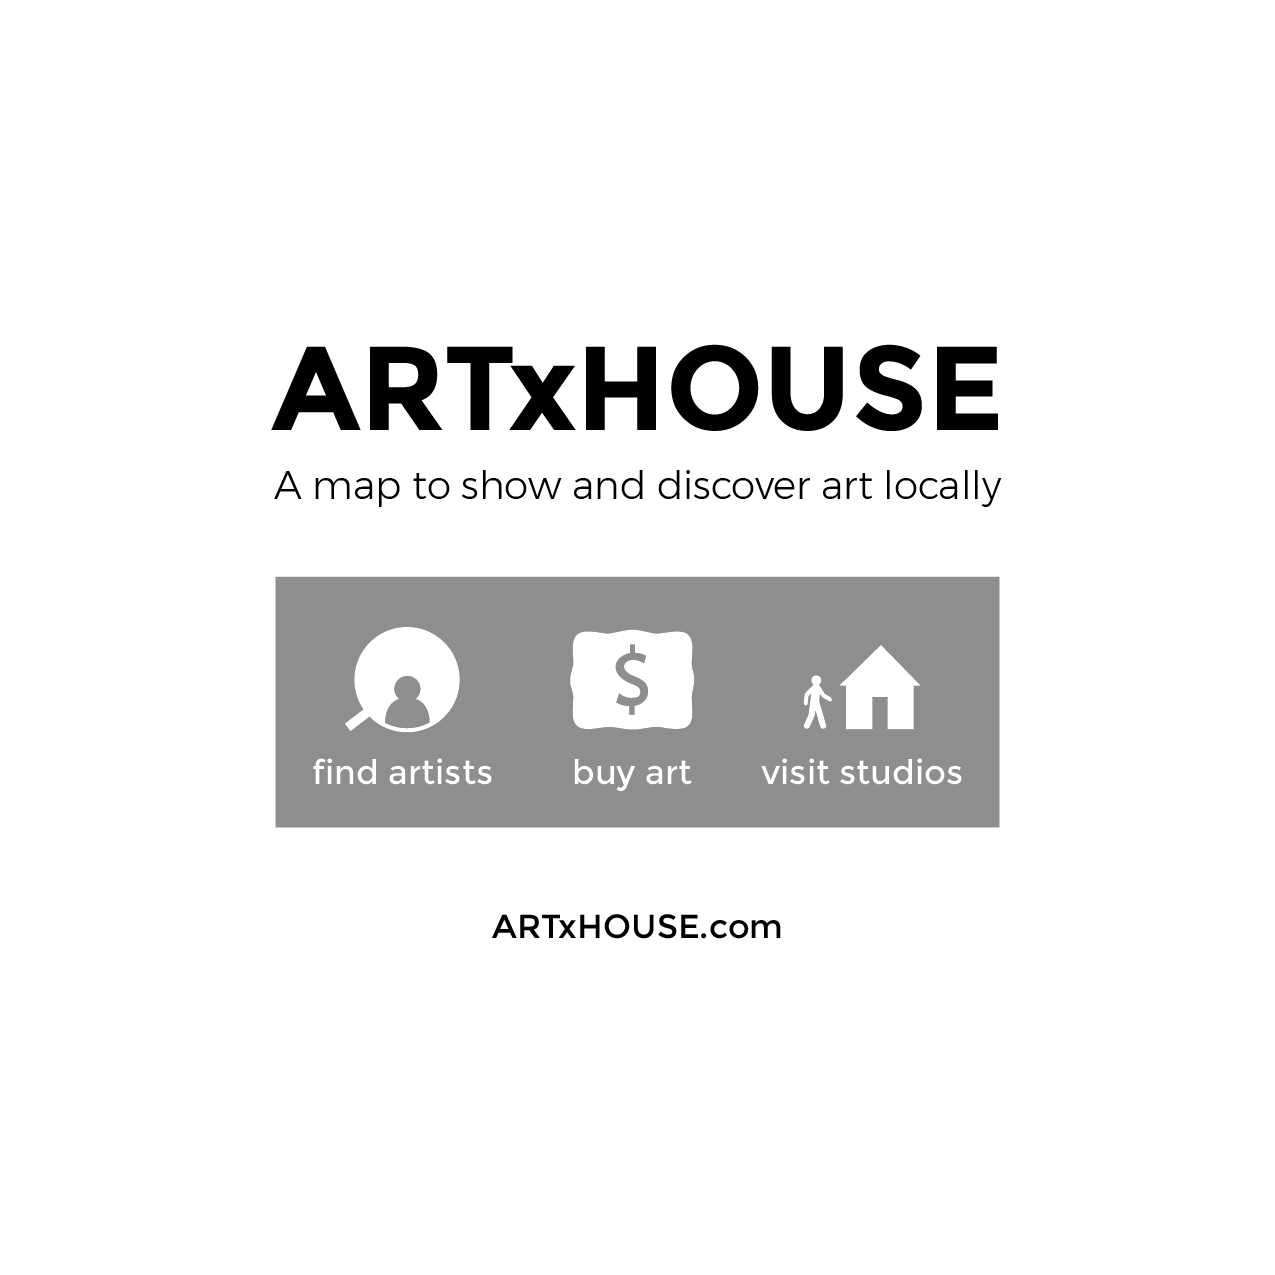 artxhouse flyer 2-01.png